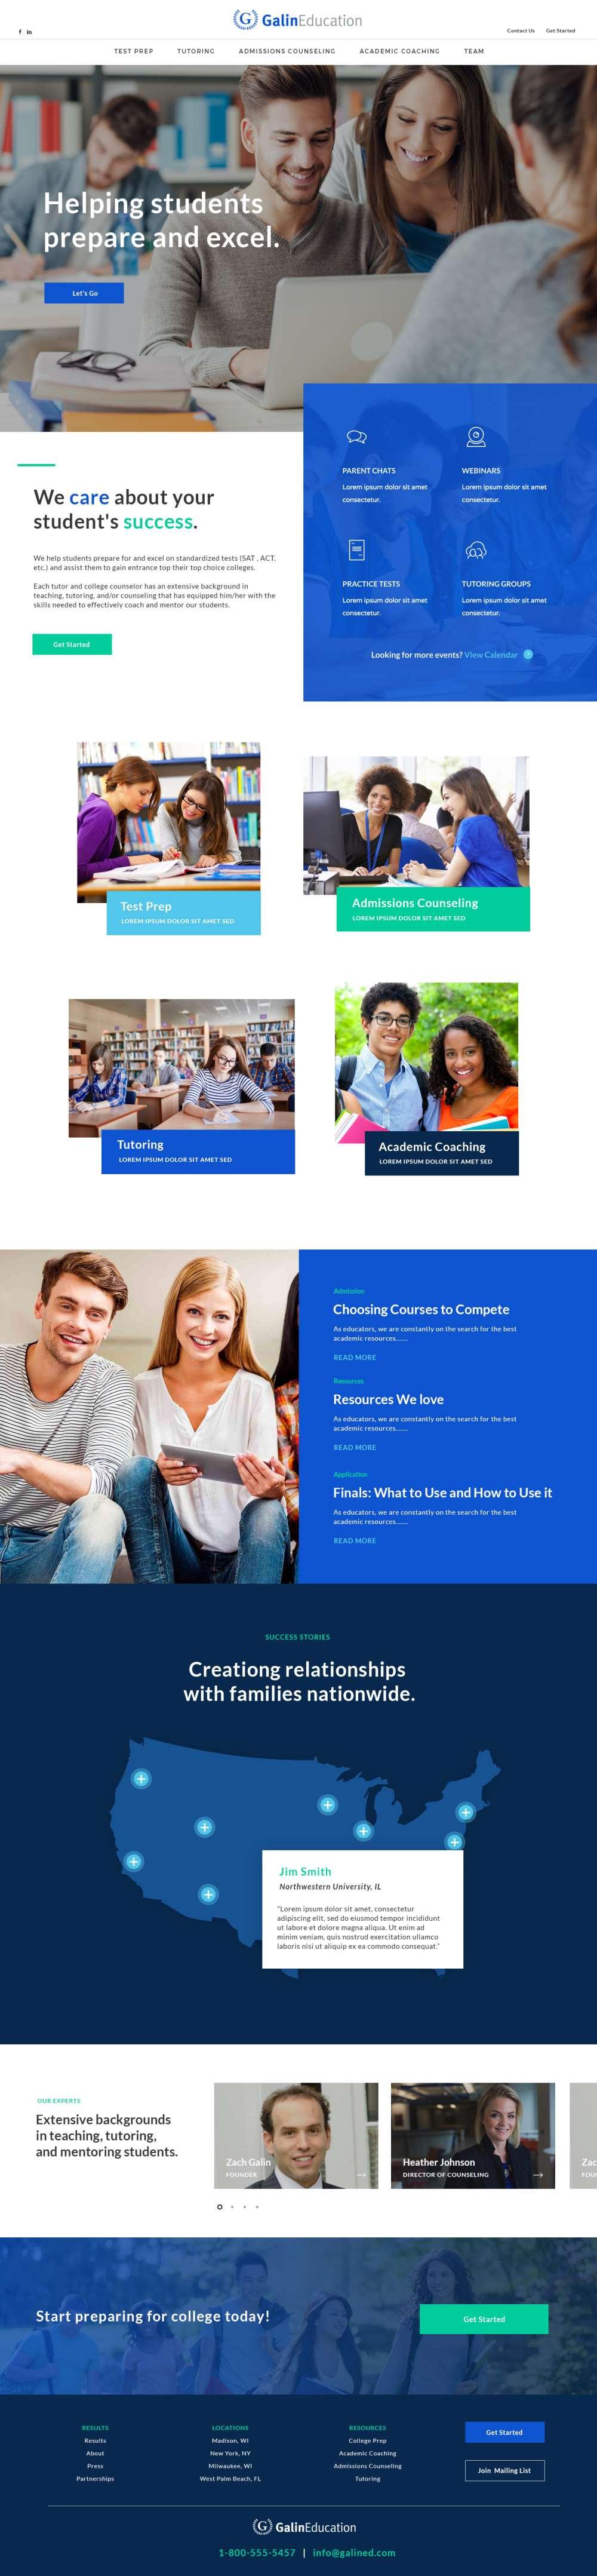 Education Web Design Inspiration